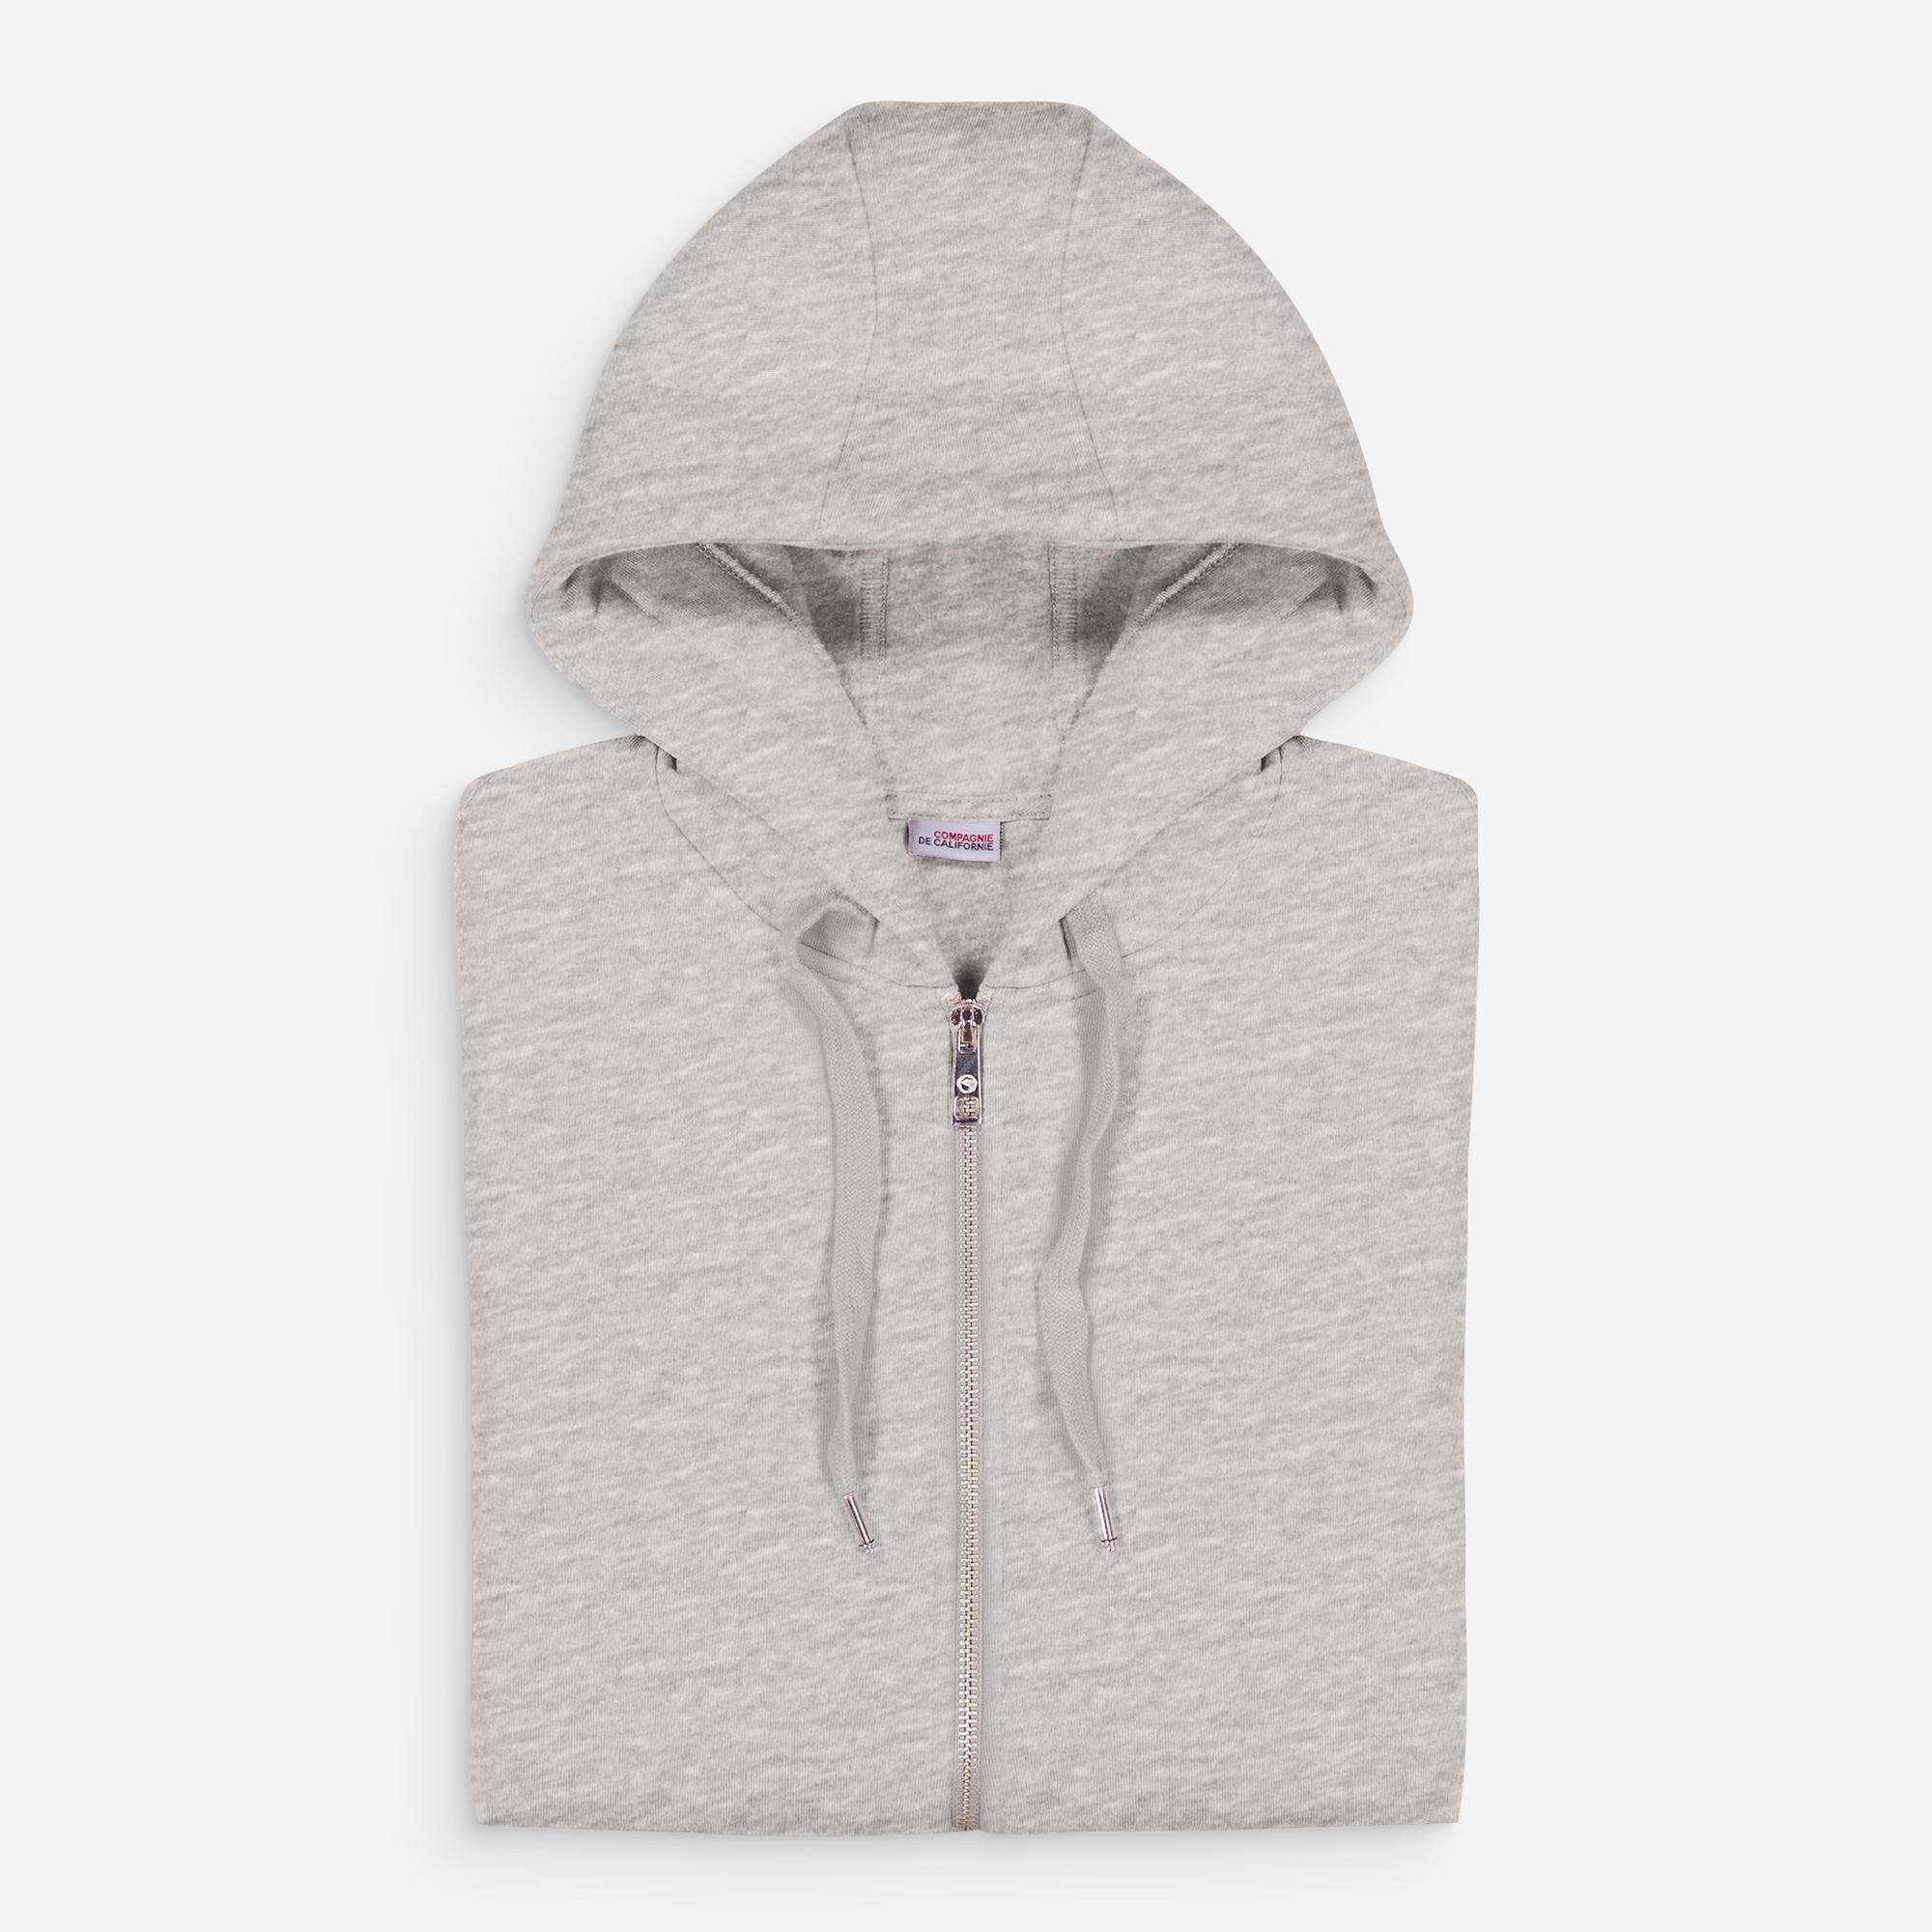 new cupertino hoodie zip heather grey